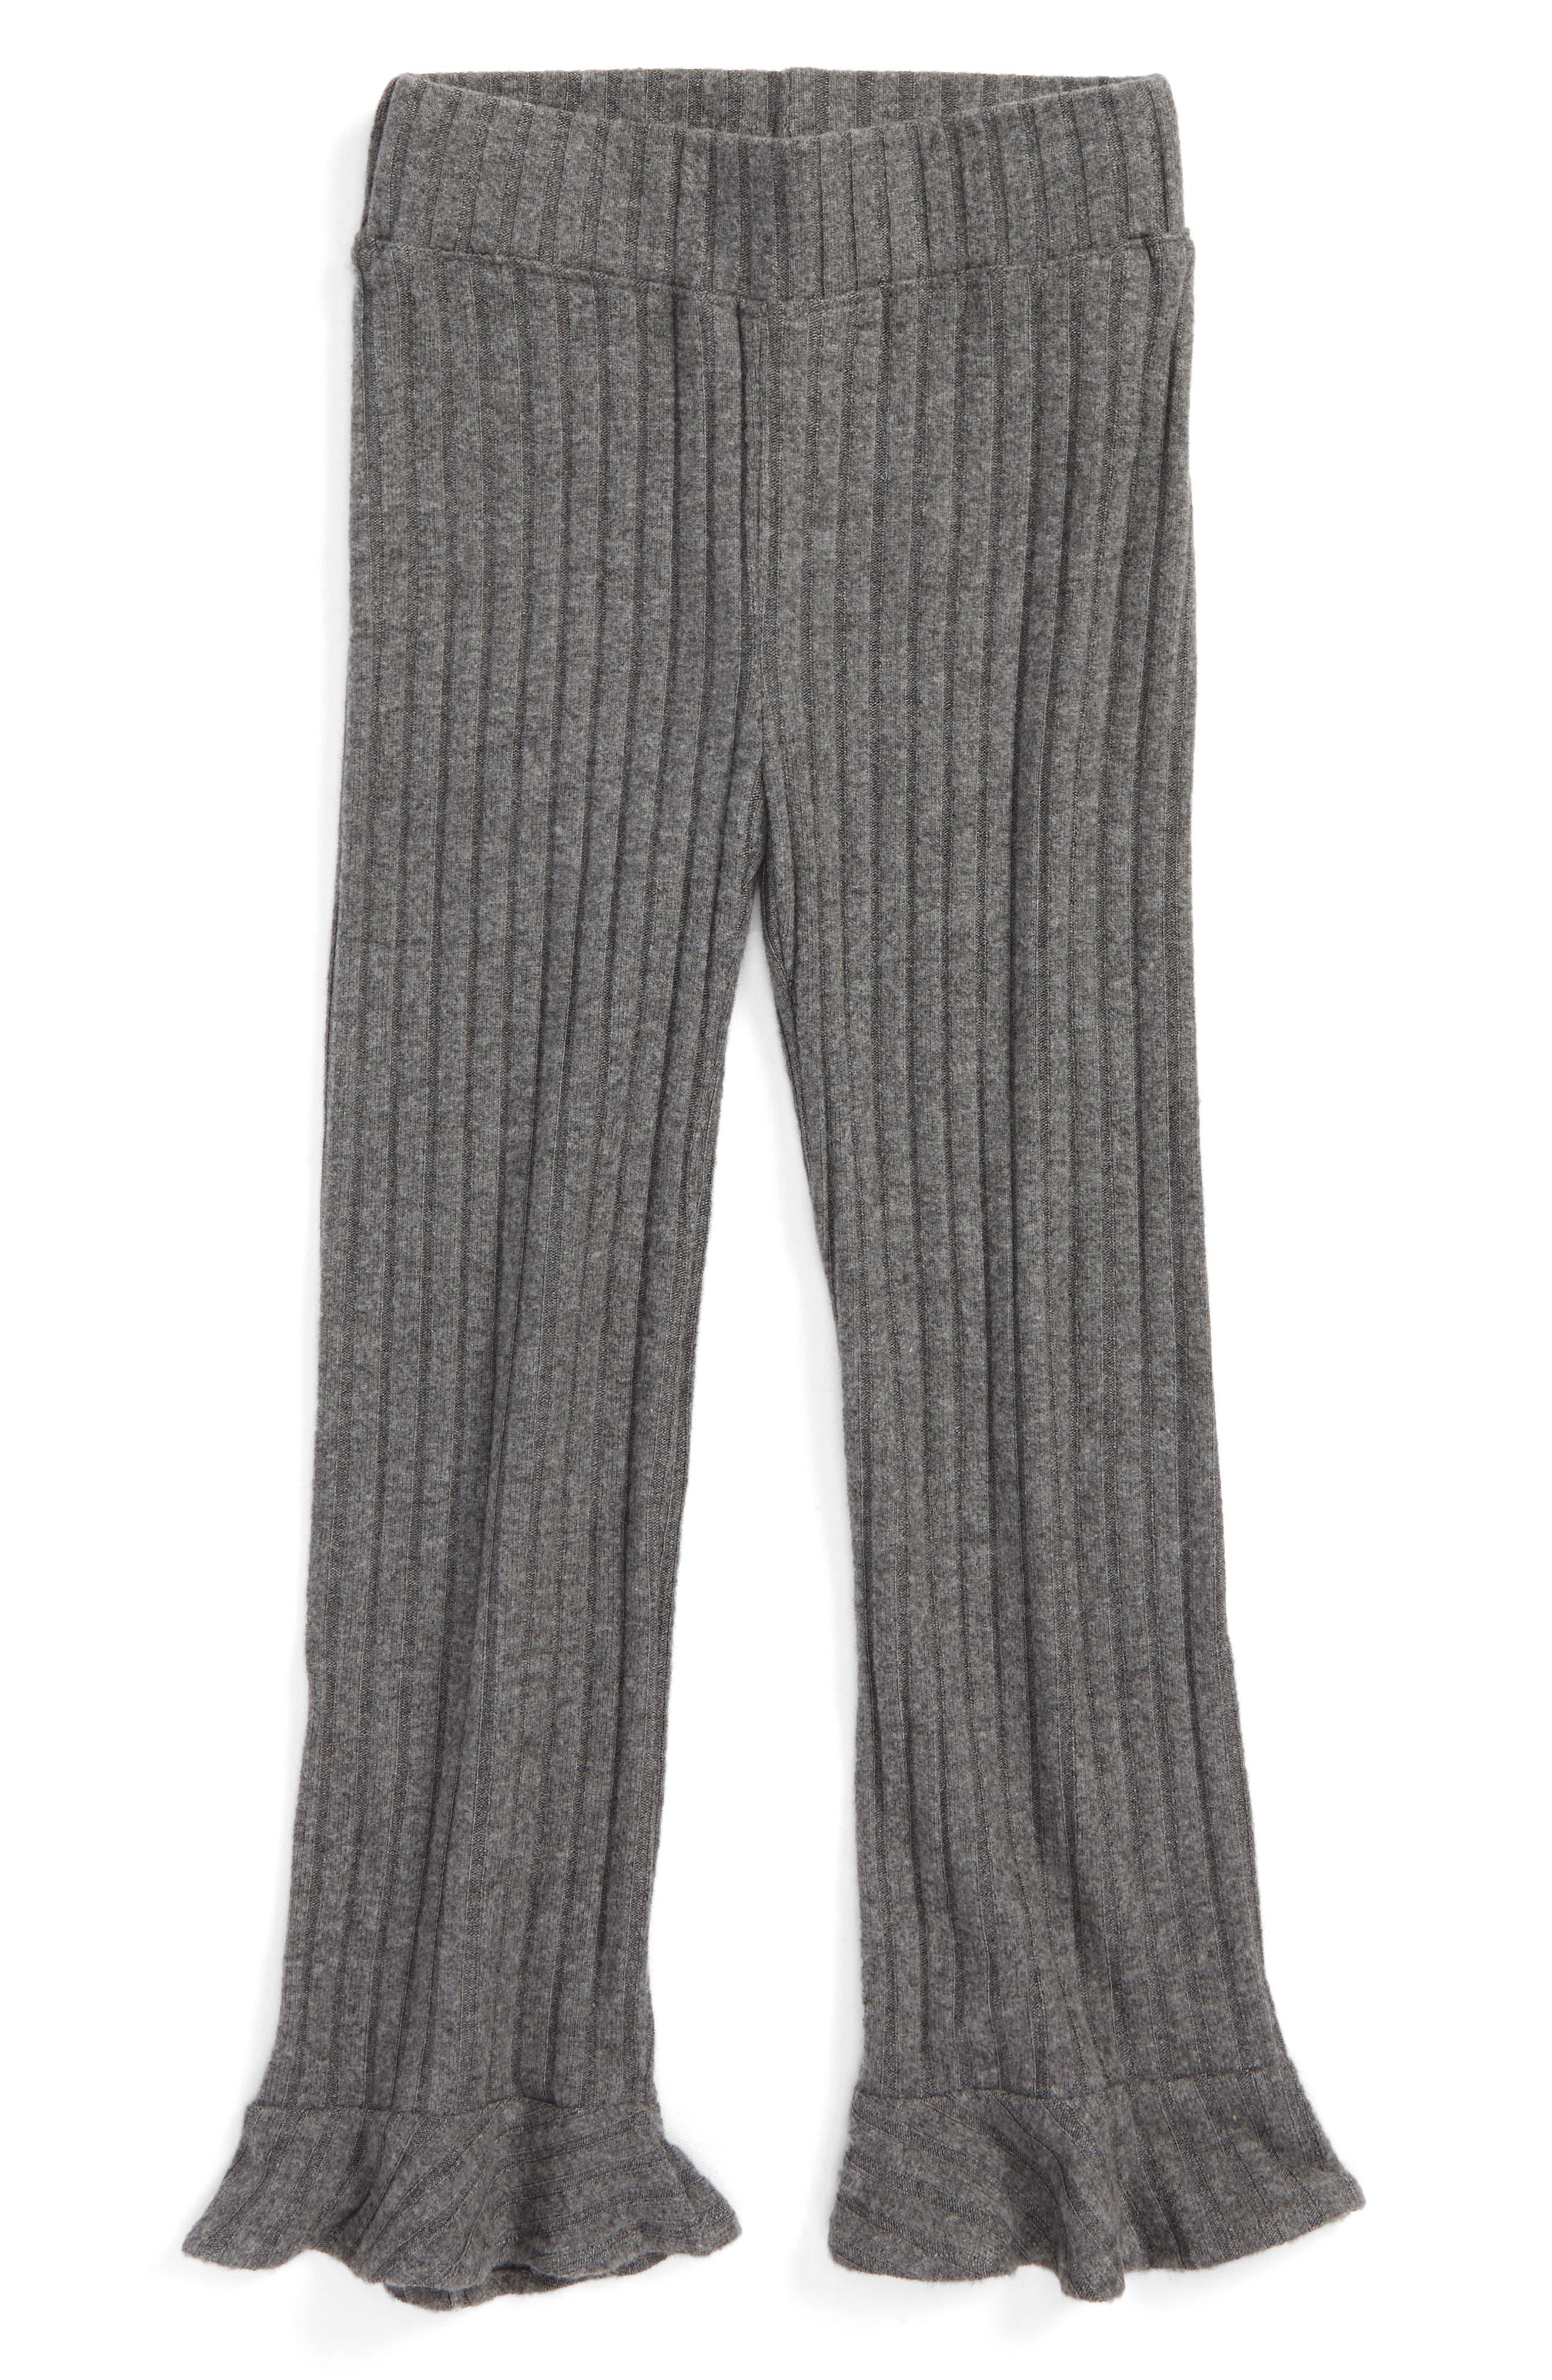 Main Image - BERU Penny Organic Cotton Flared Ruffle Pants (Toddler Girls & Little Girls)